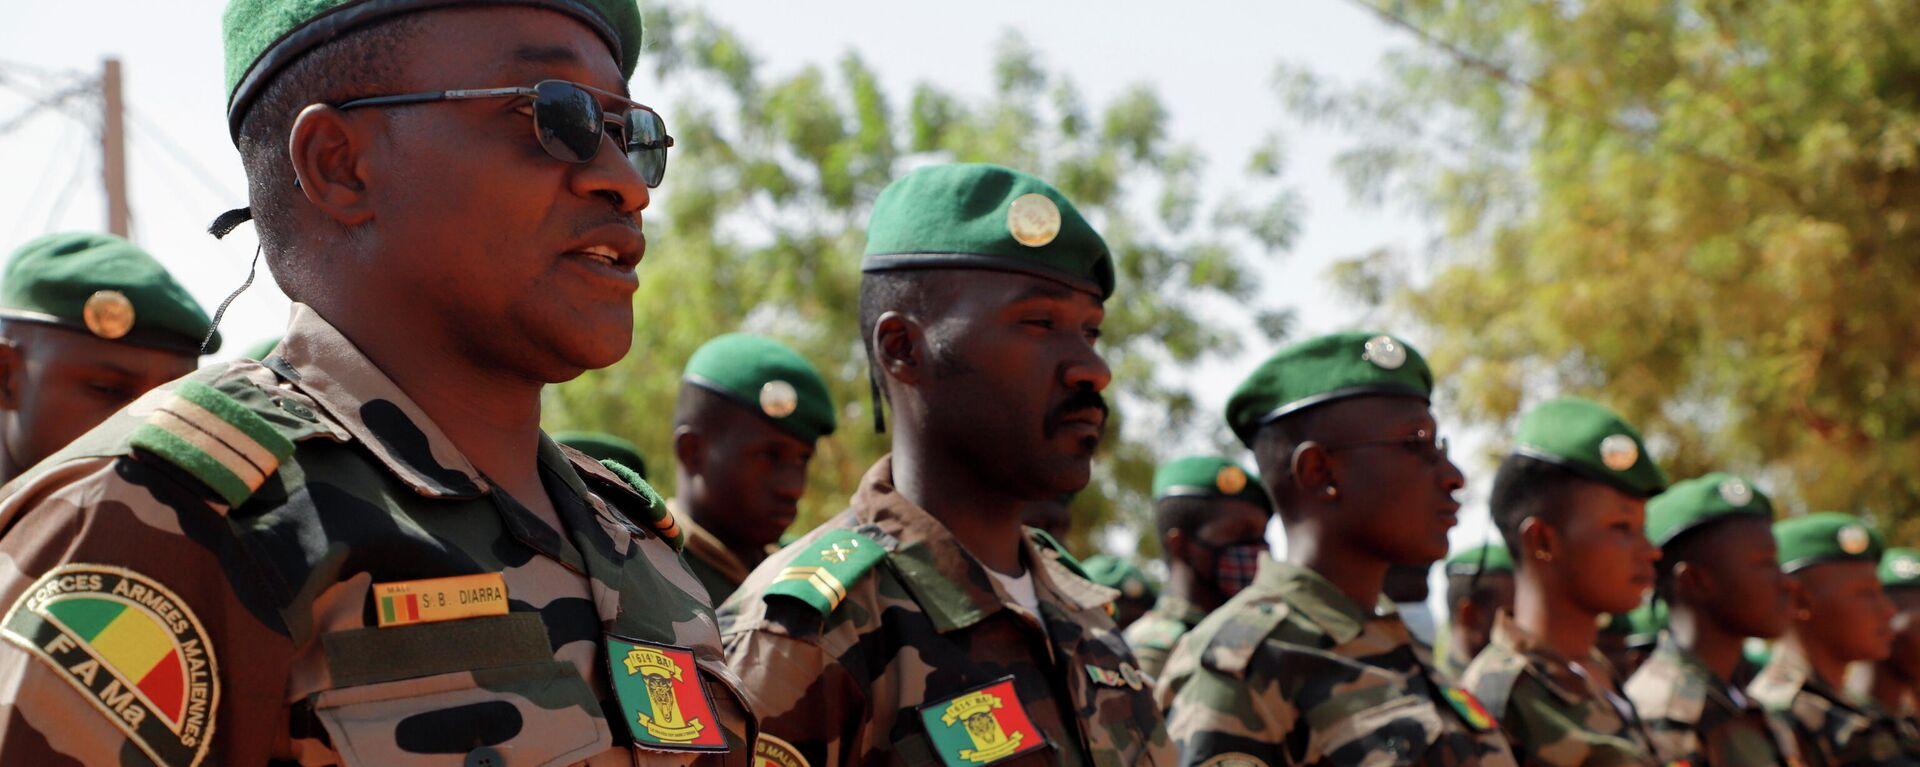 Soldaten in Mali - SNA, 1920, 30.05.2021